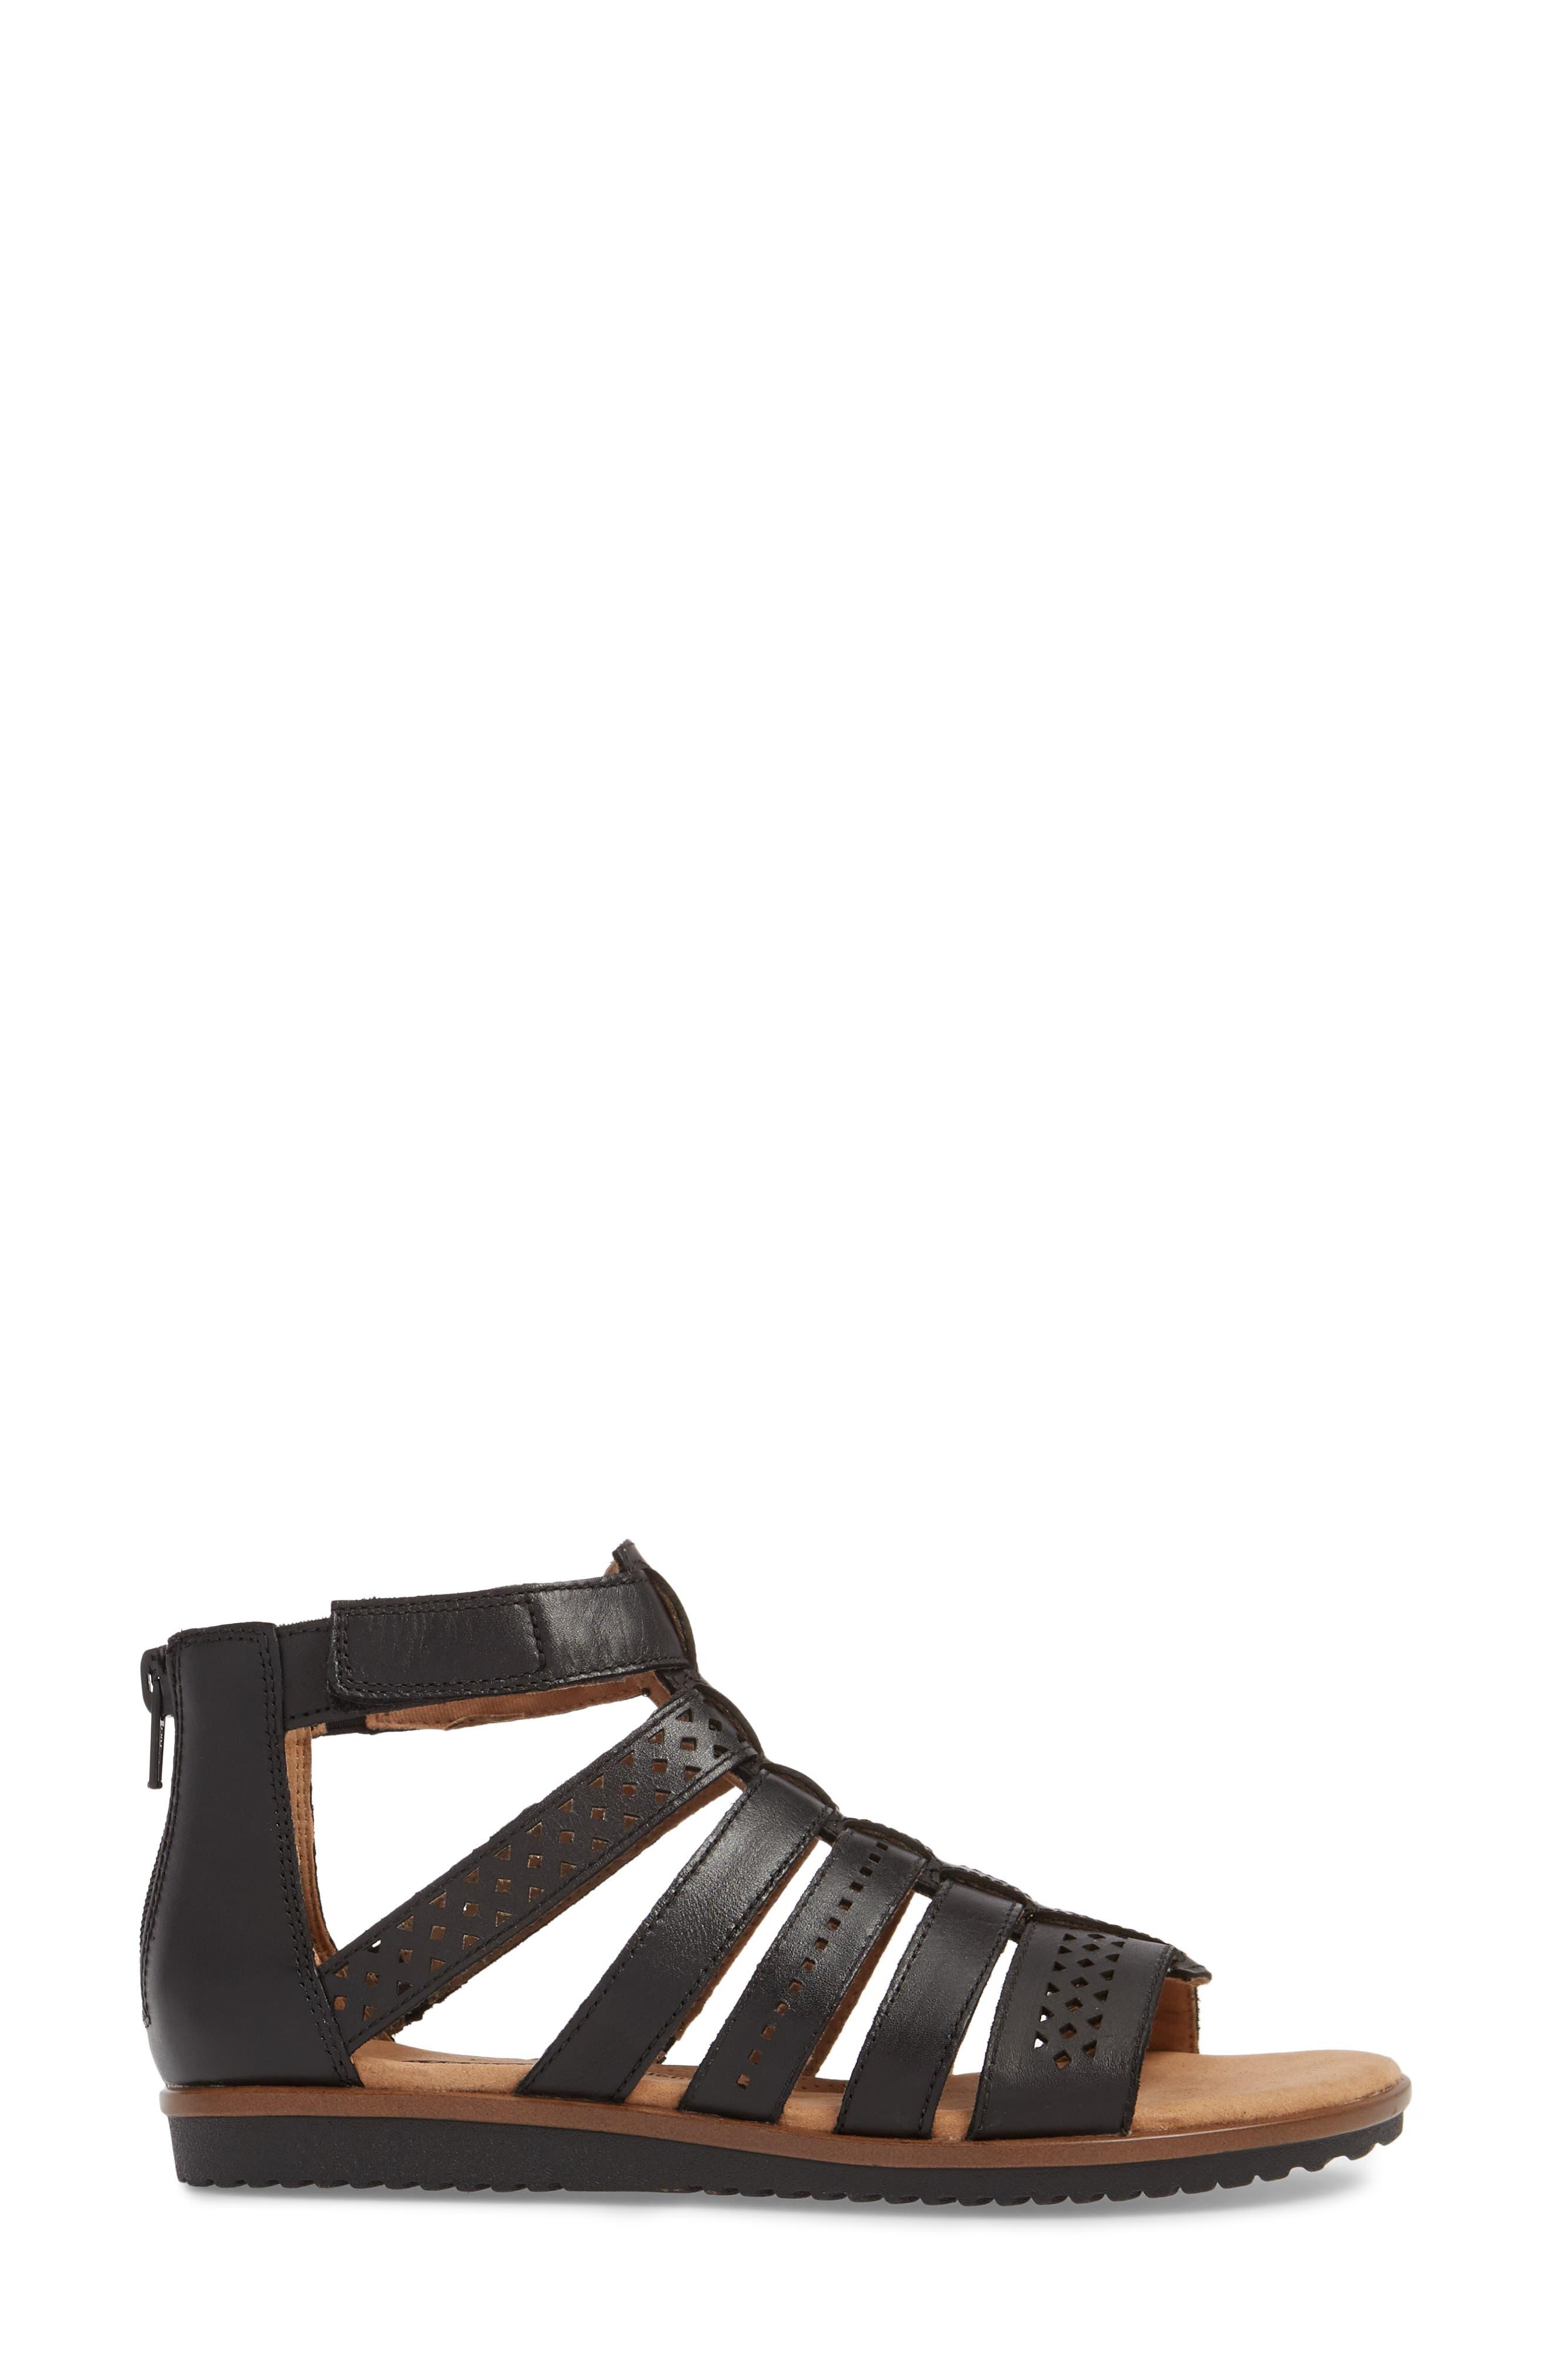 Alternate Image 3  - Clarks® Kele Lotus Sandal (Women)